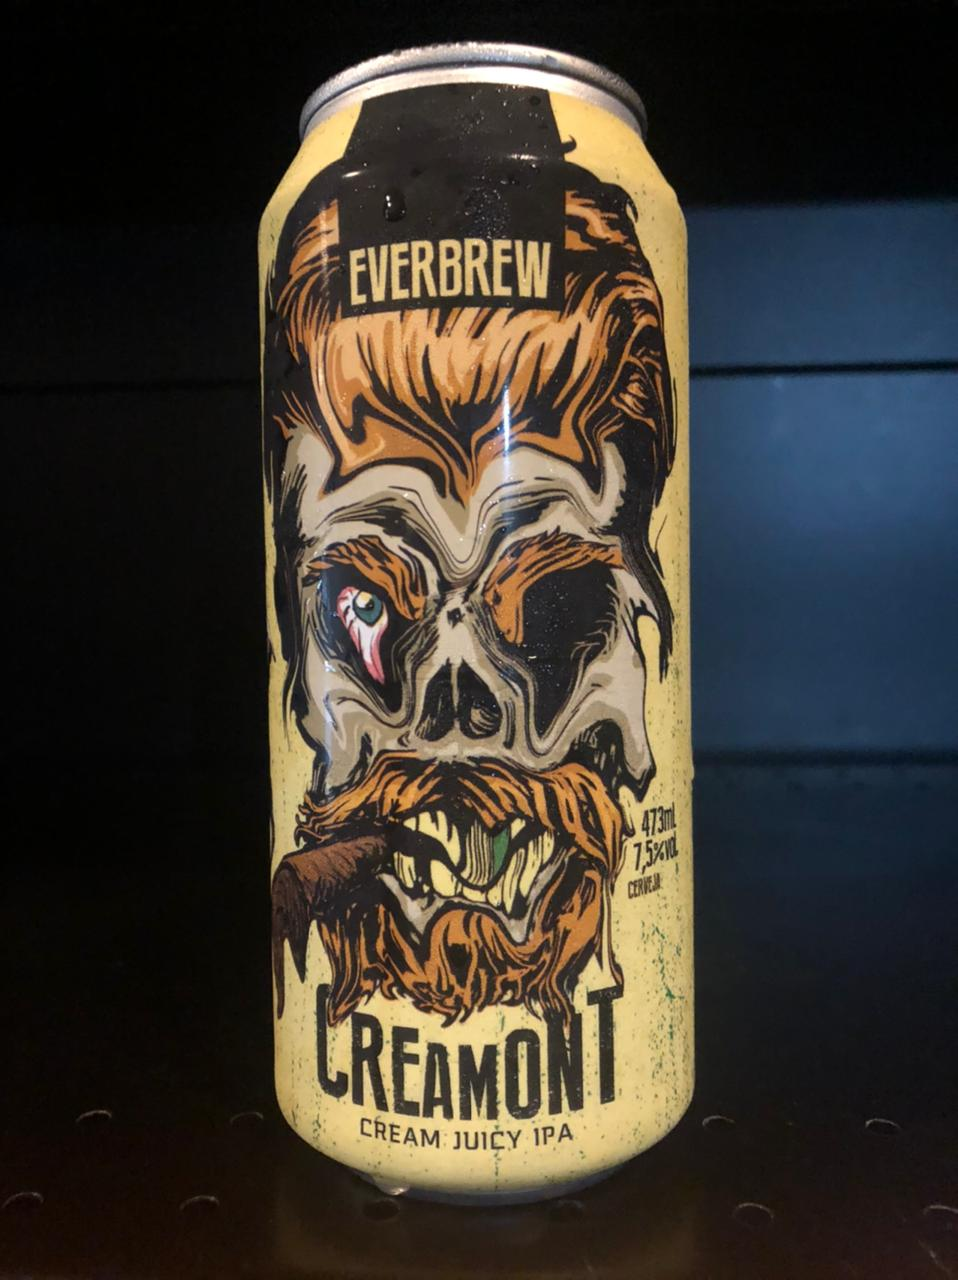 Everbrew Creamont Lata 473ml - Cream Juicy IPA